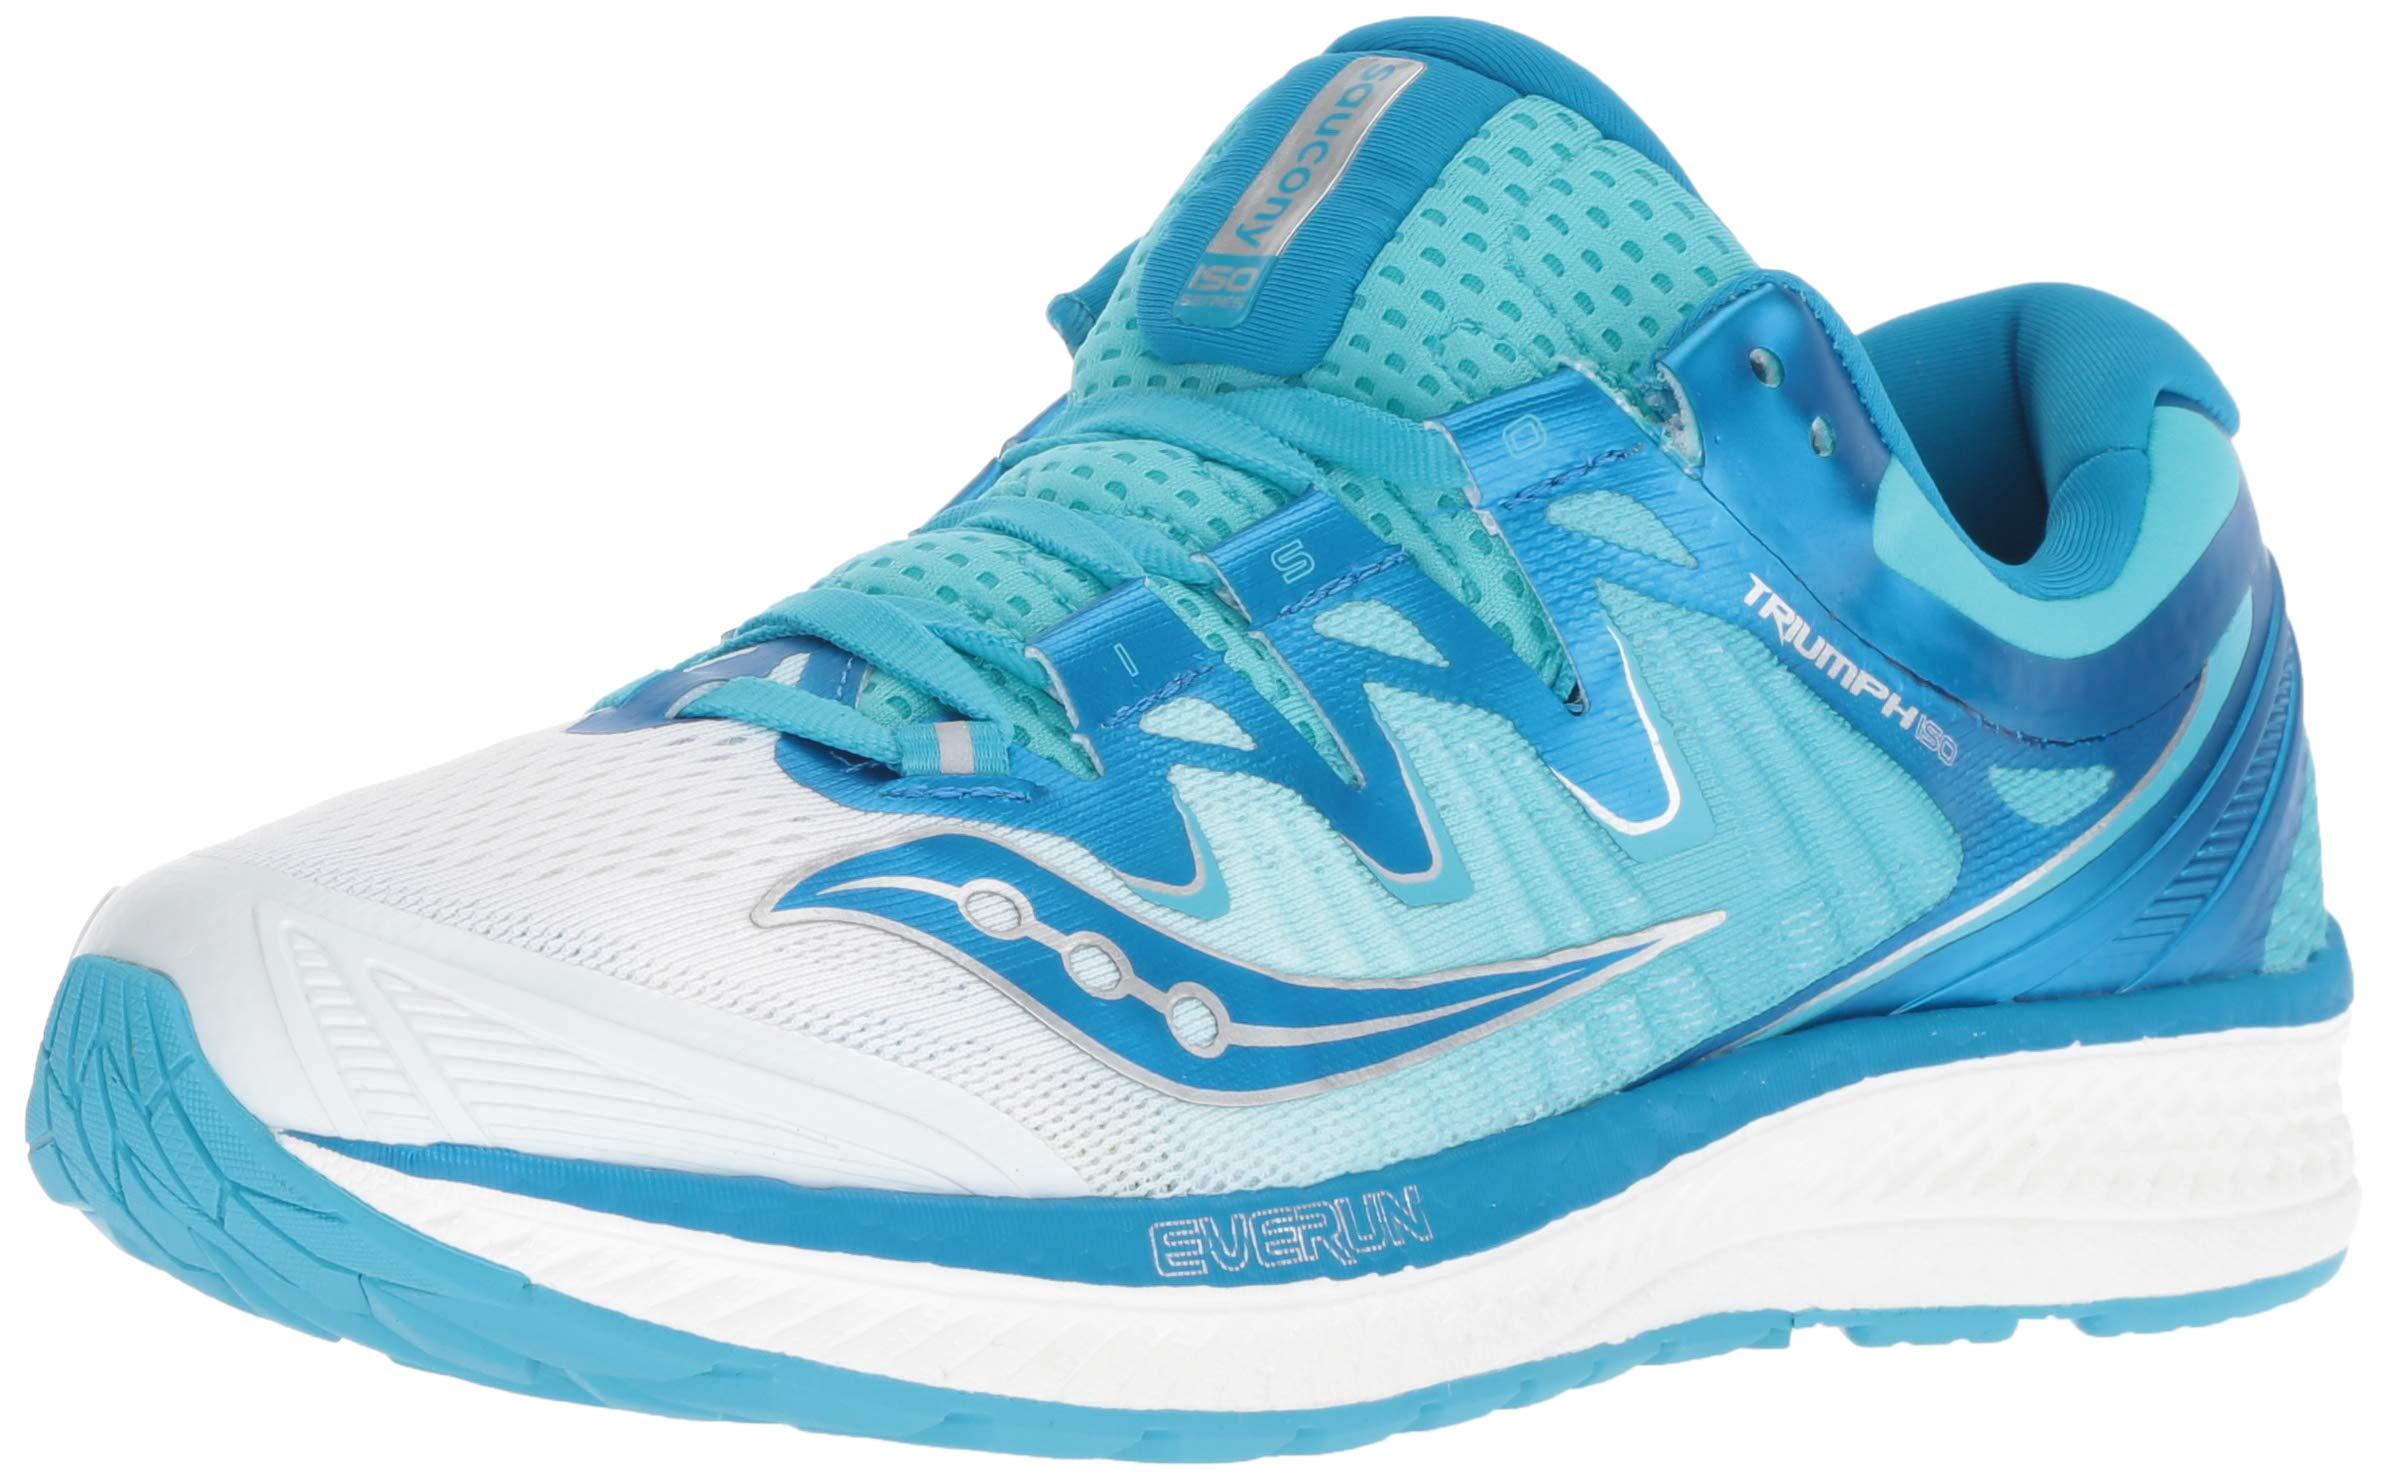 Saucony Women's Triumph ISO 4 Sneaker, White/Blue, 050 M US